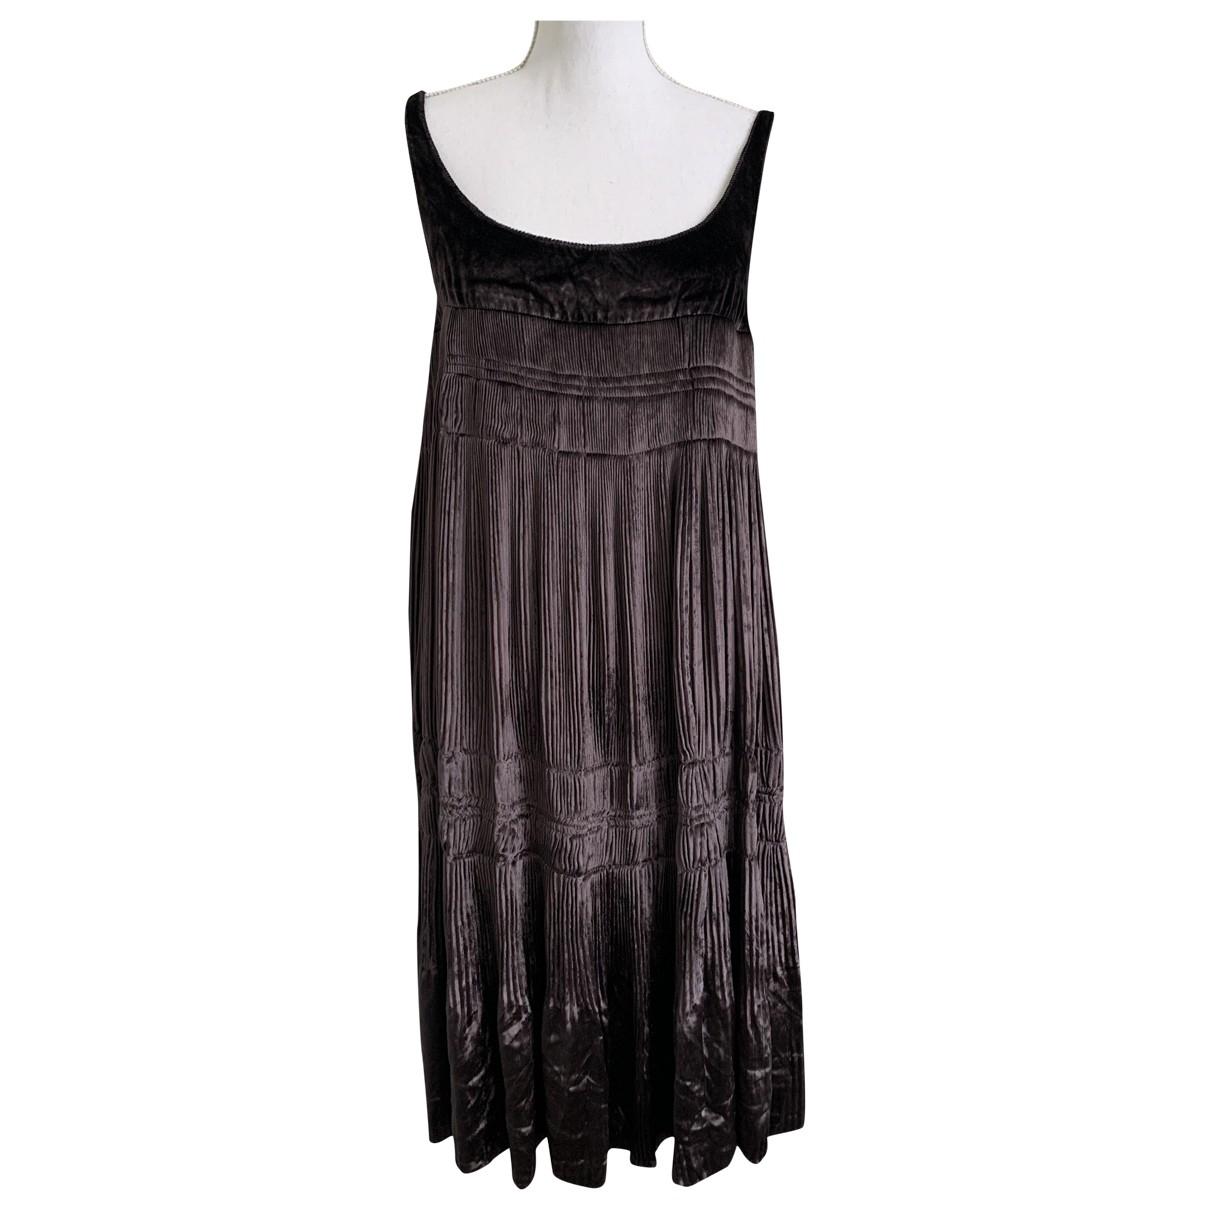 Burberry - Robe   pour femme en velours - marron